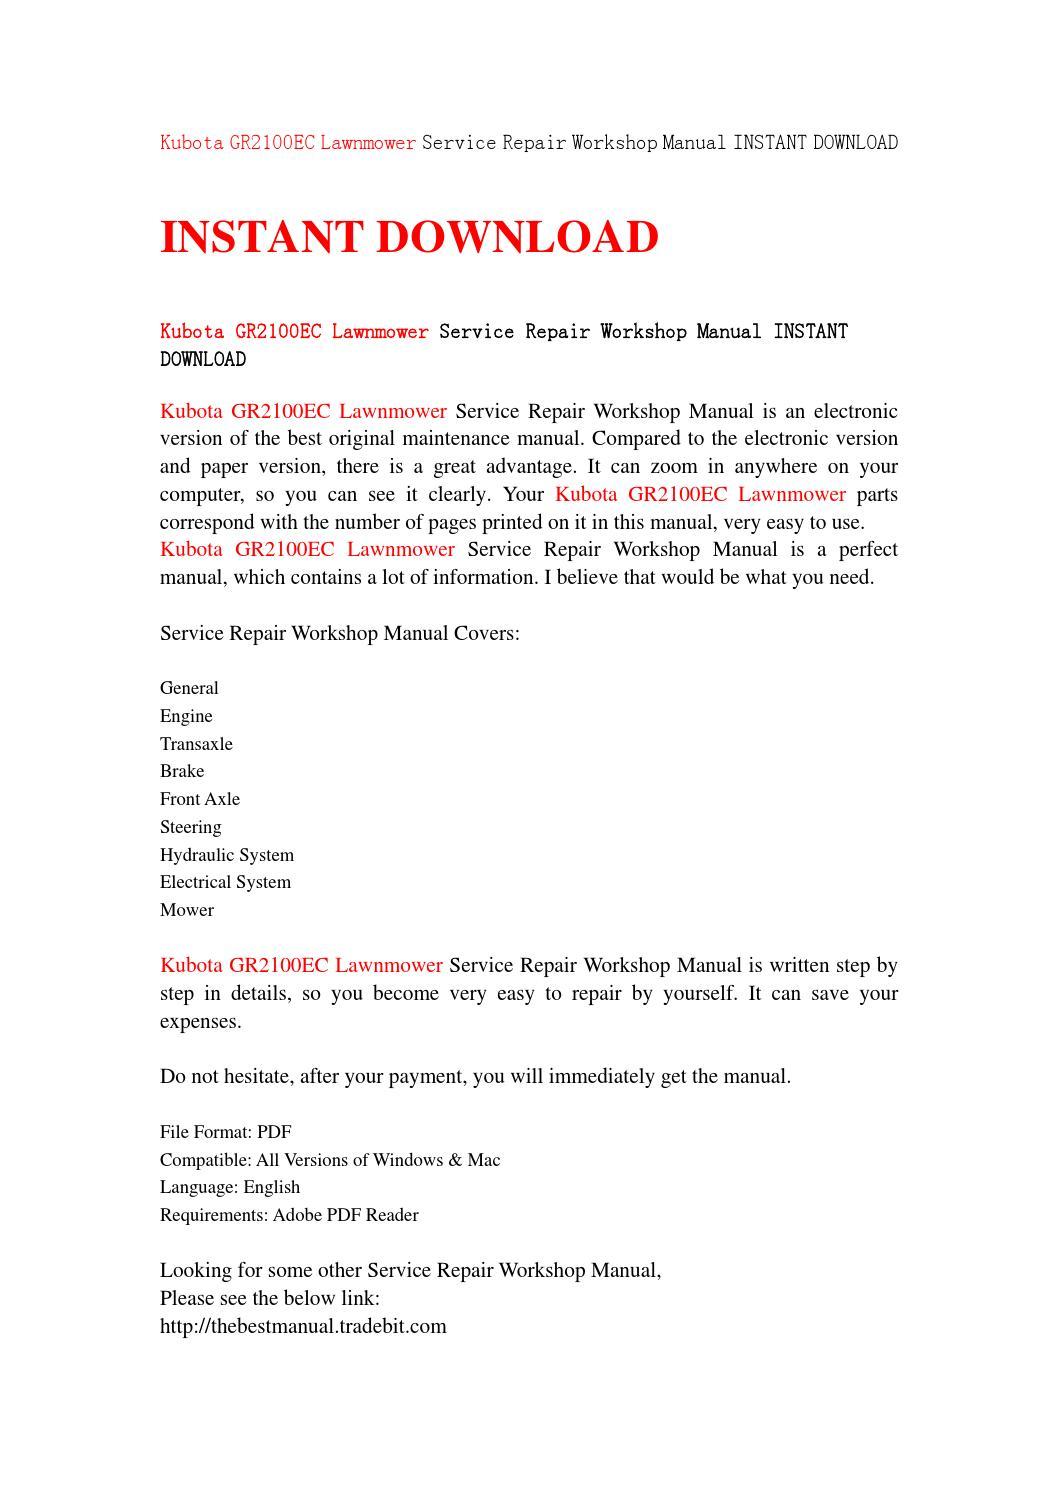 Kubota gr2100ec lawnmower service repair workshop manual instant download  by sjefhsnen - issuu